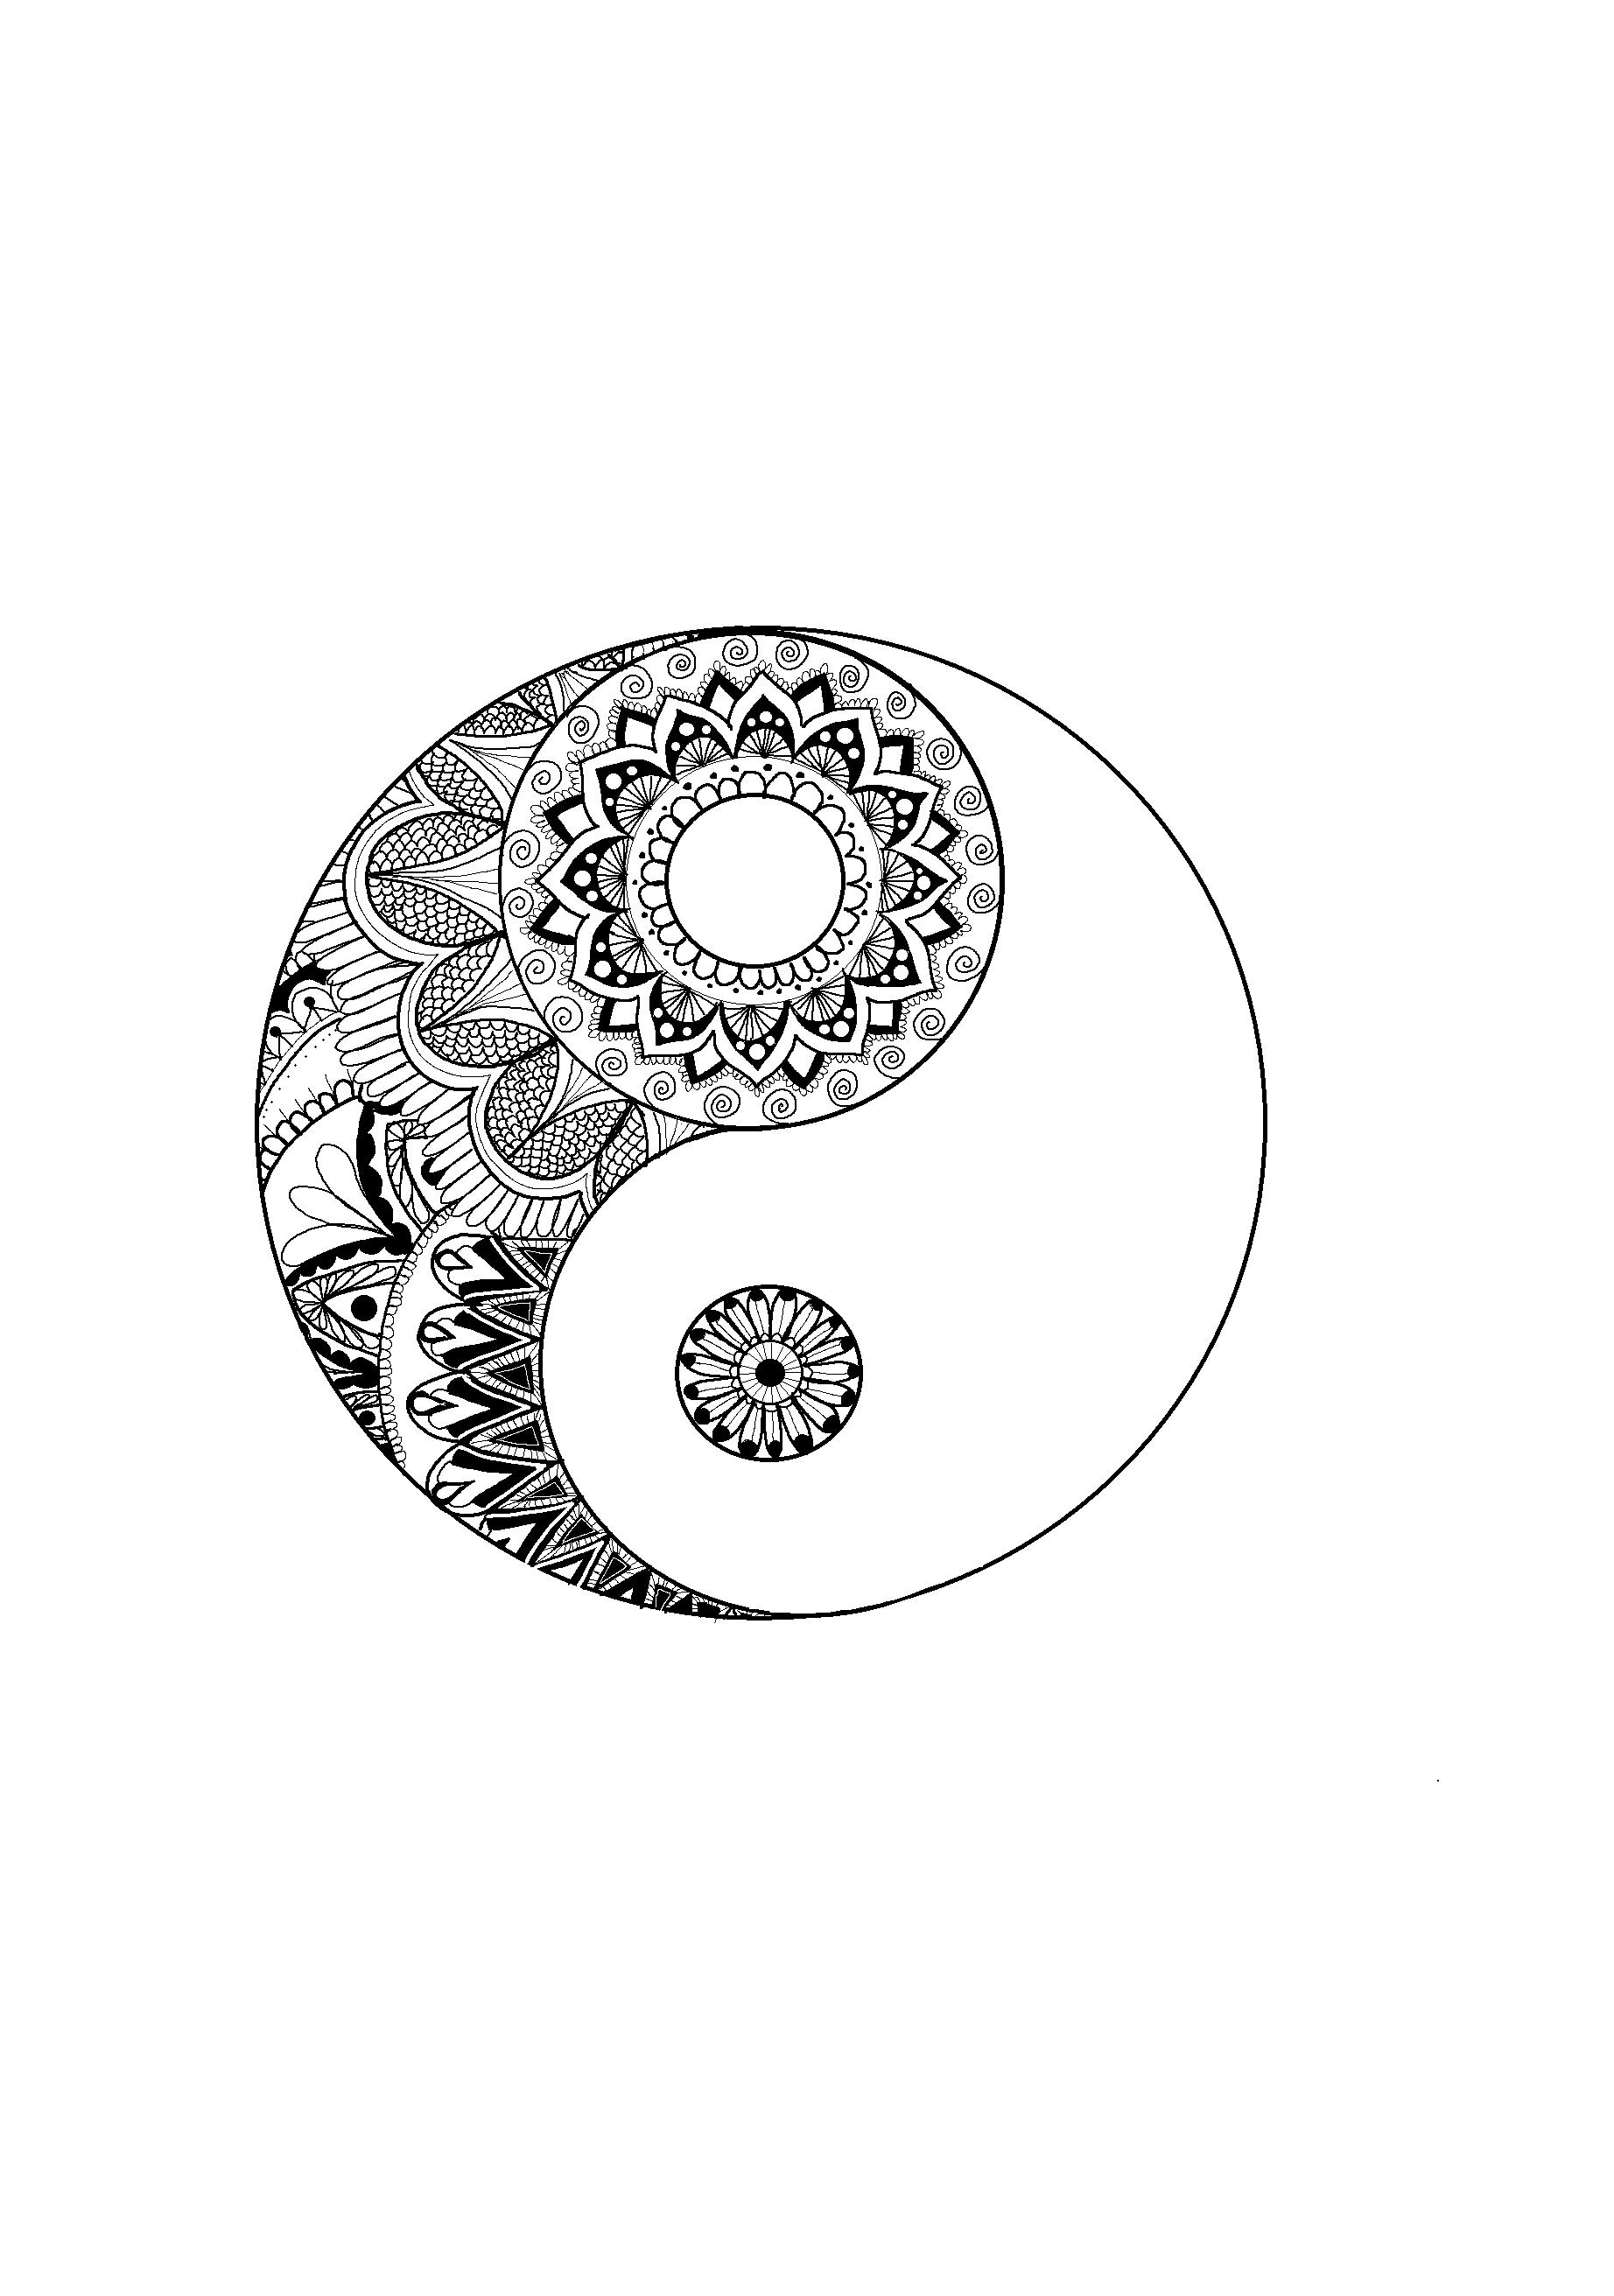 yin yang tattoo meanings - Google Search   Flower tattoo ideas ...